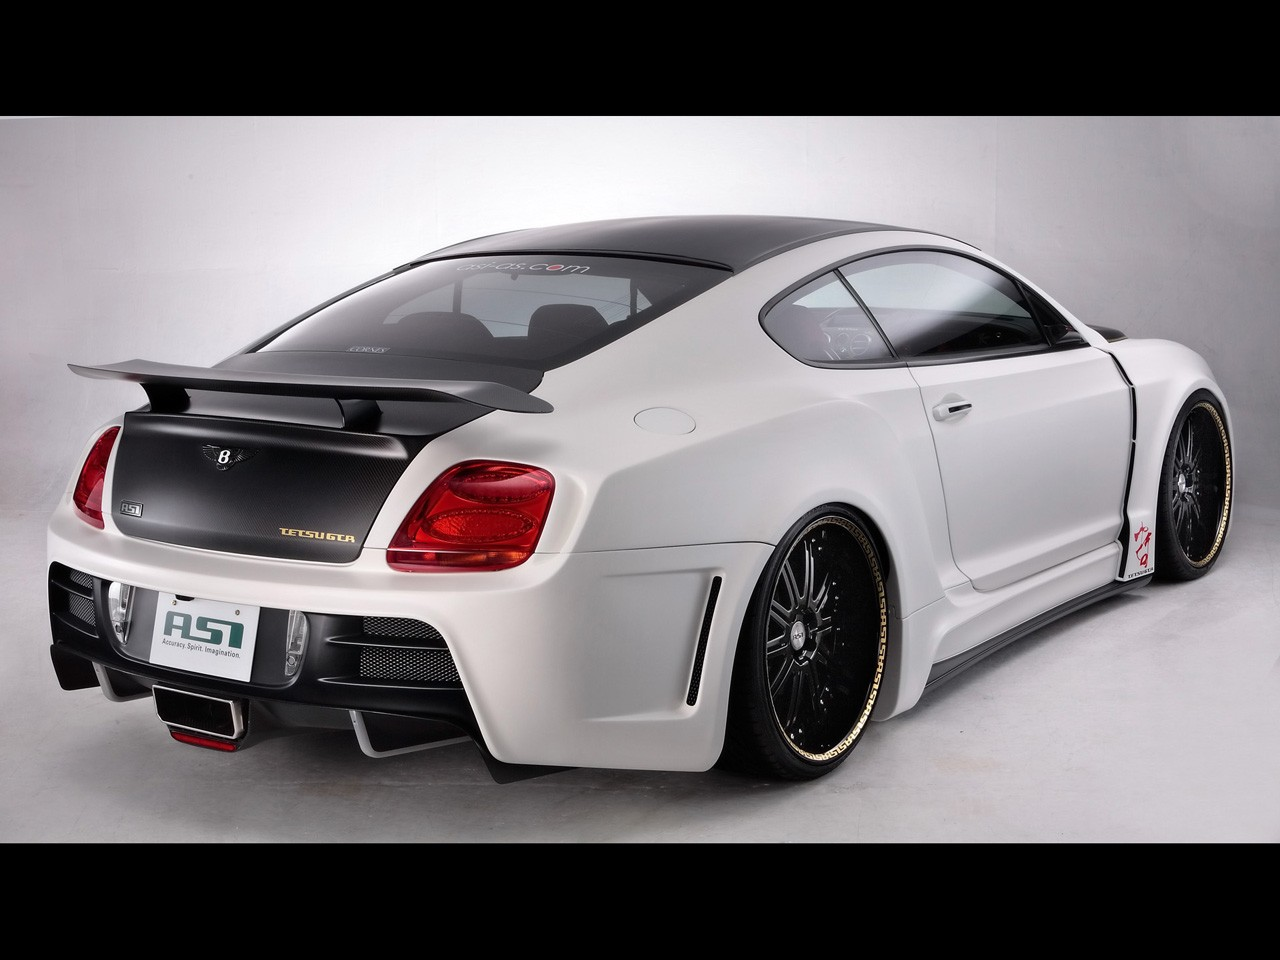 2008 ASI Bentley Continental Tetsu GTR